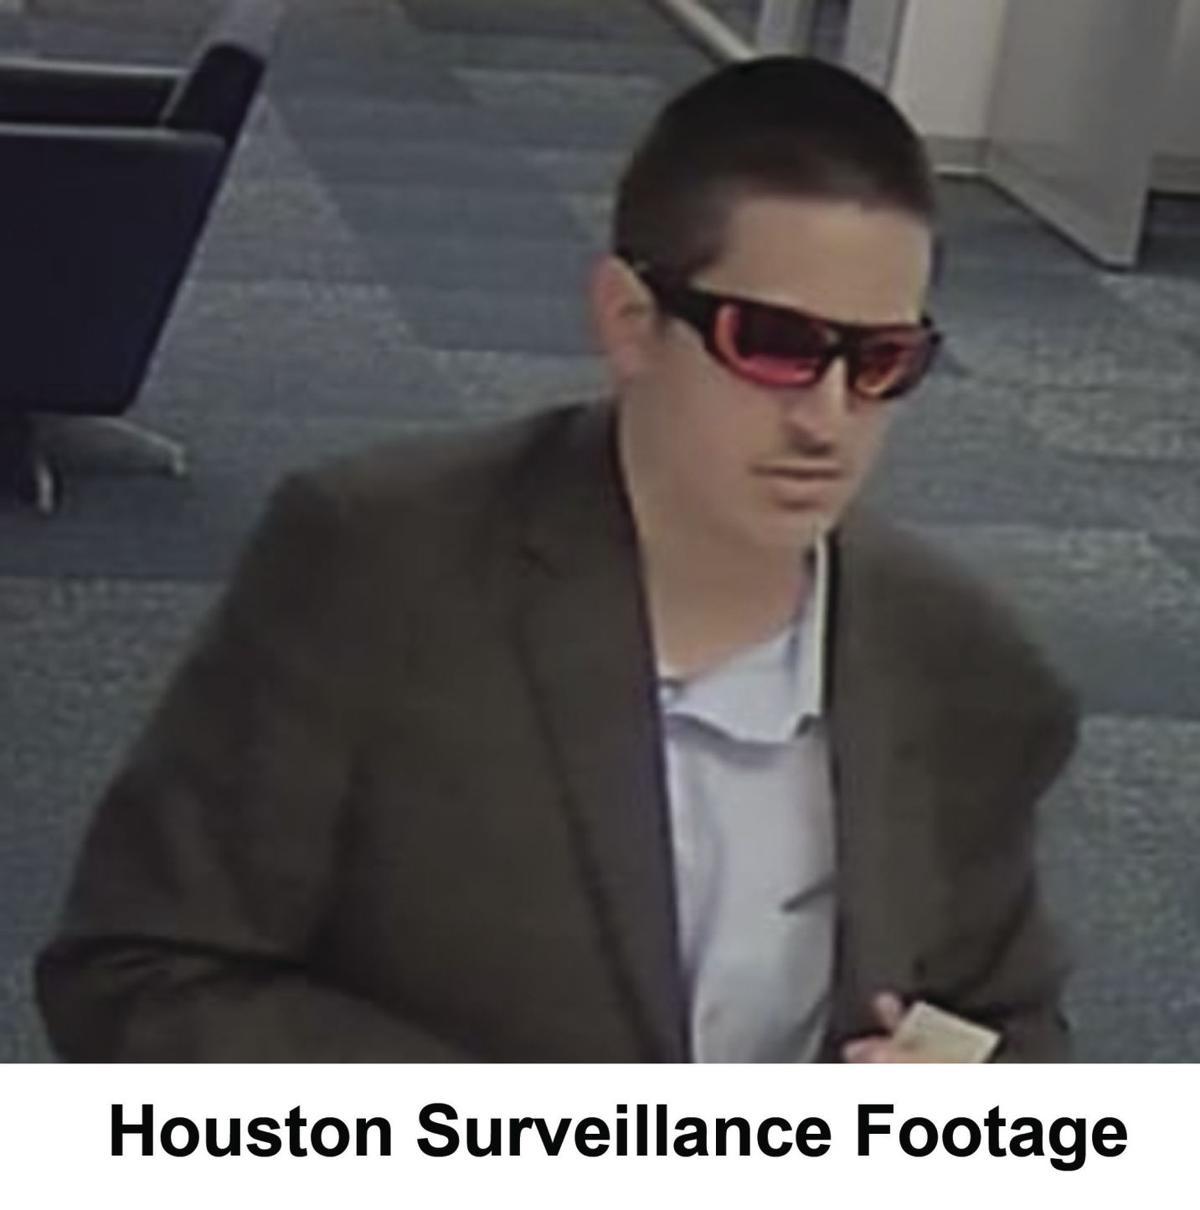 Robbery Suspect in Houston